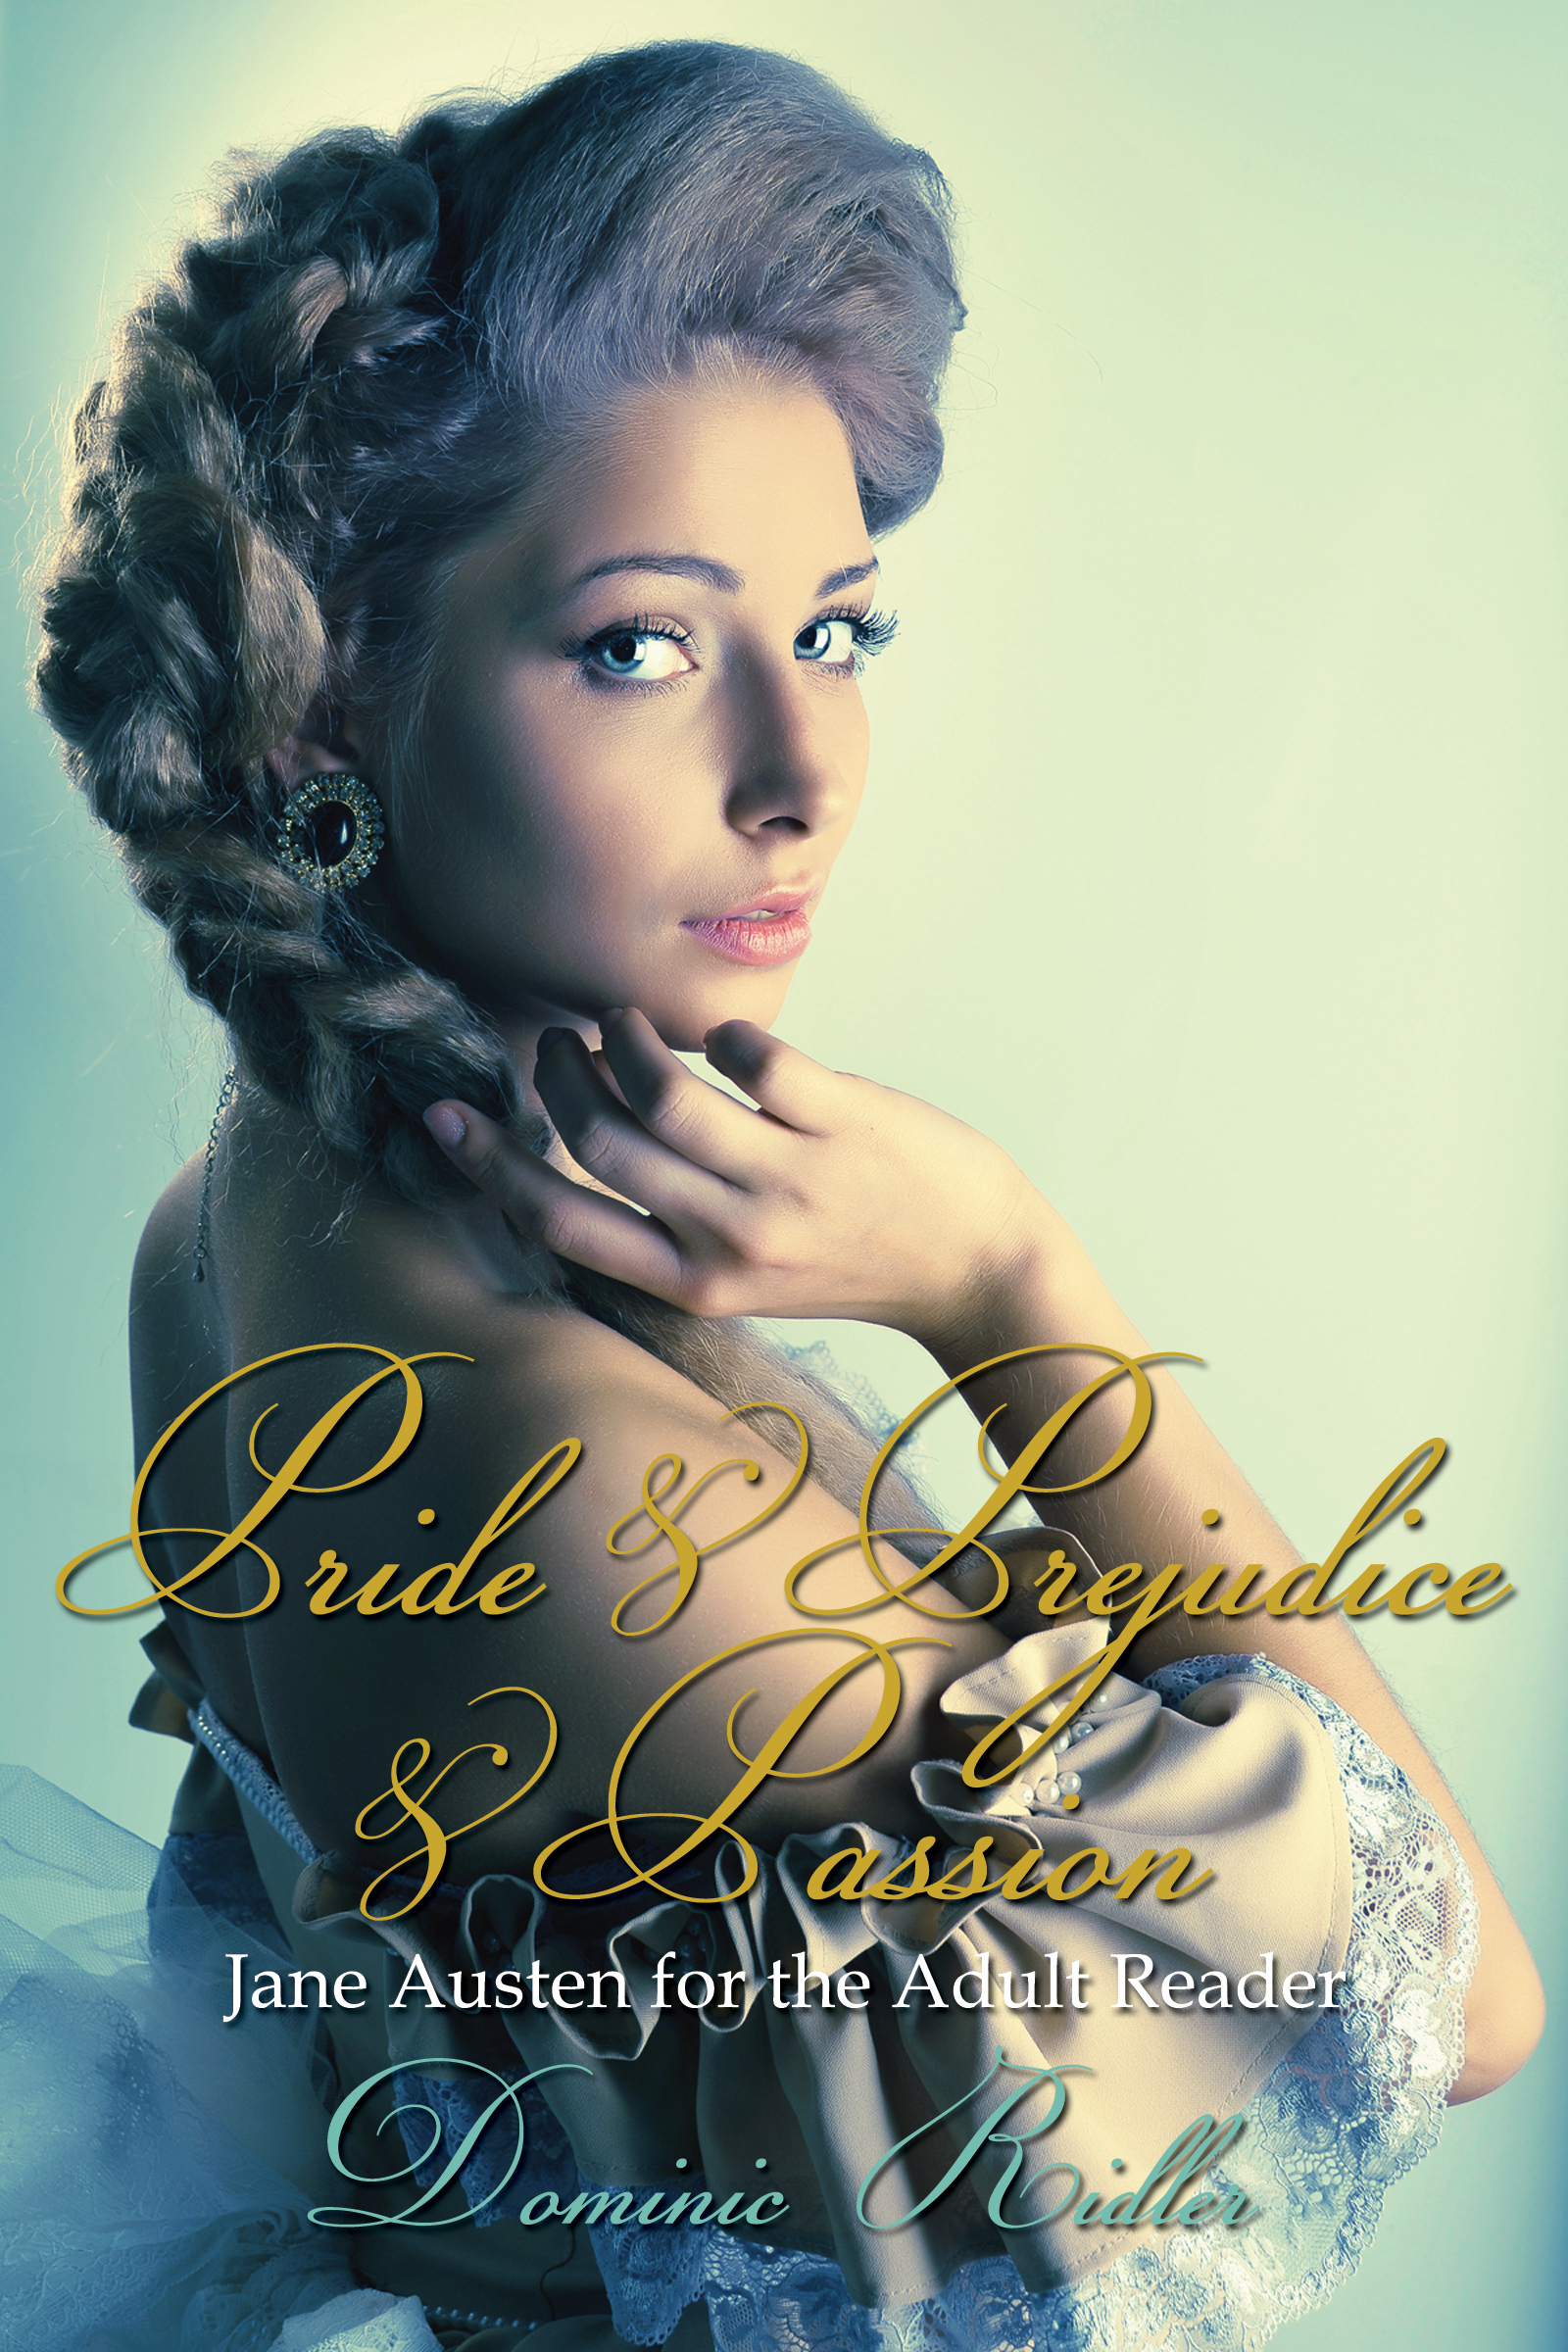 Pride  Prejudice  Passion: Jane Austen for the Adult Reader